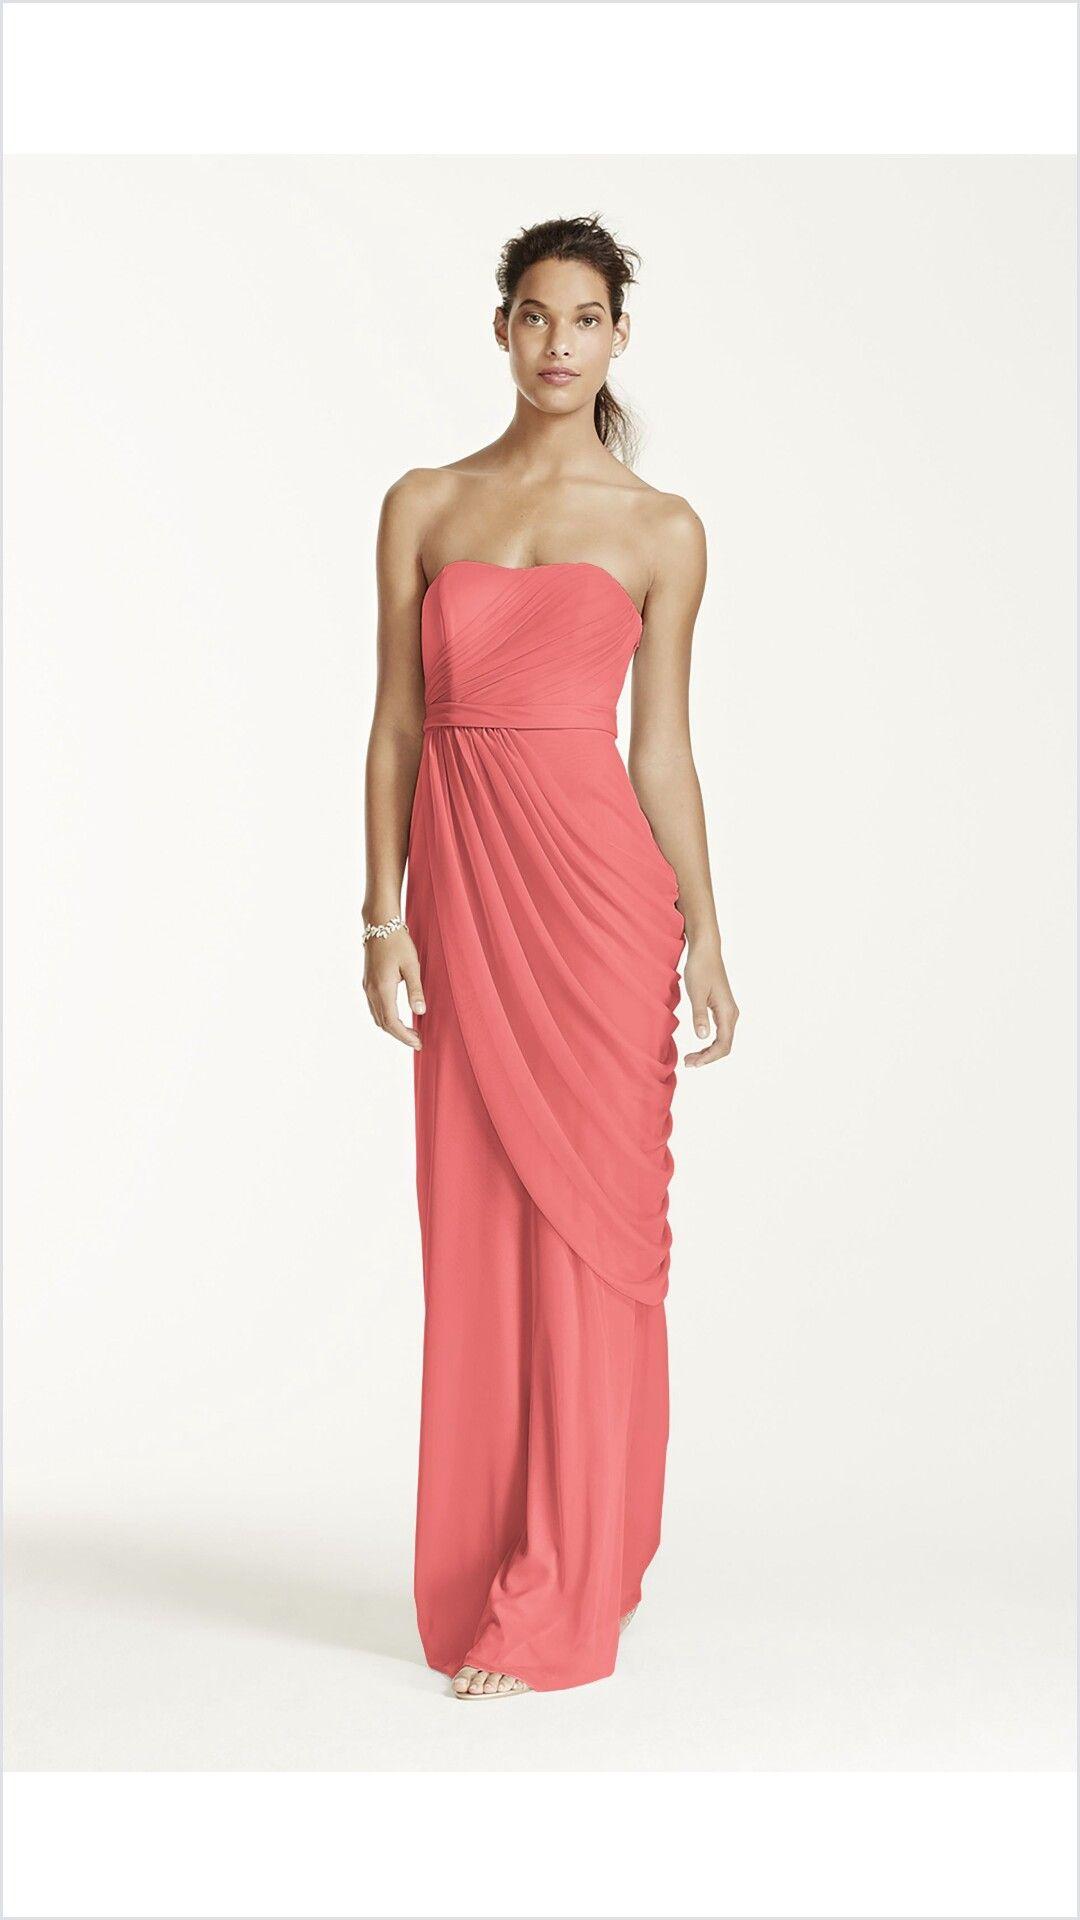 508aeb0d0e7 Junior Bridesmaid Dresses Davids Bridal - Data Dynamic AG